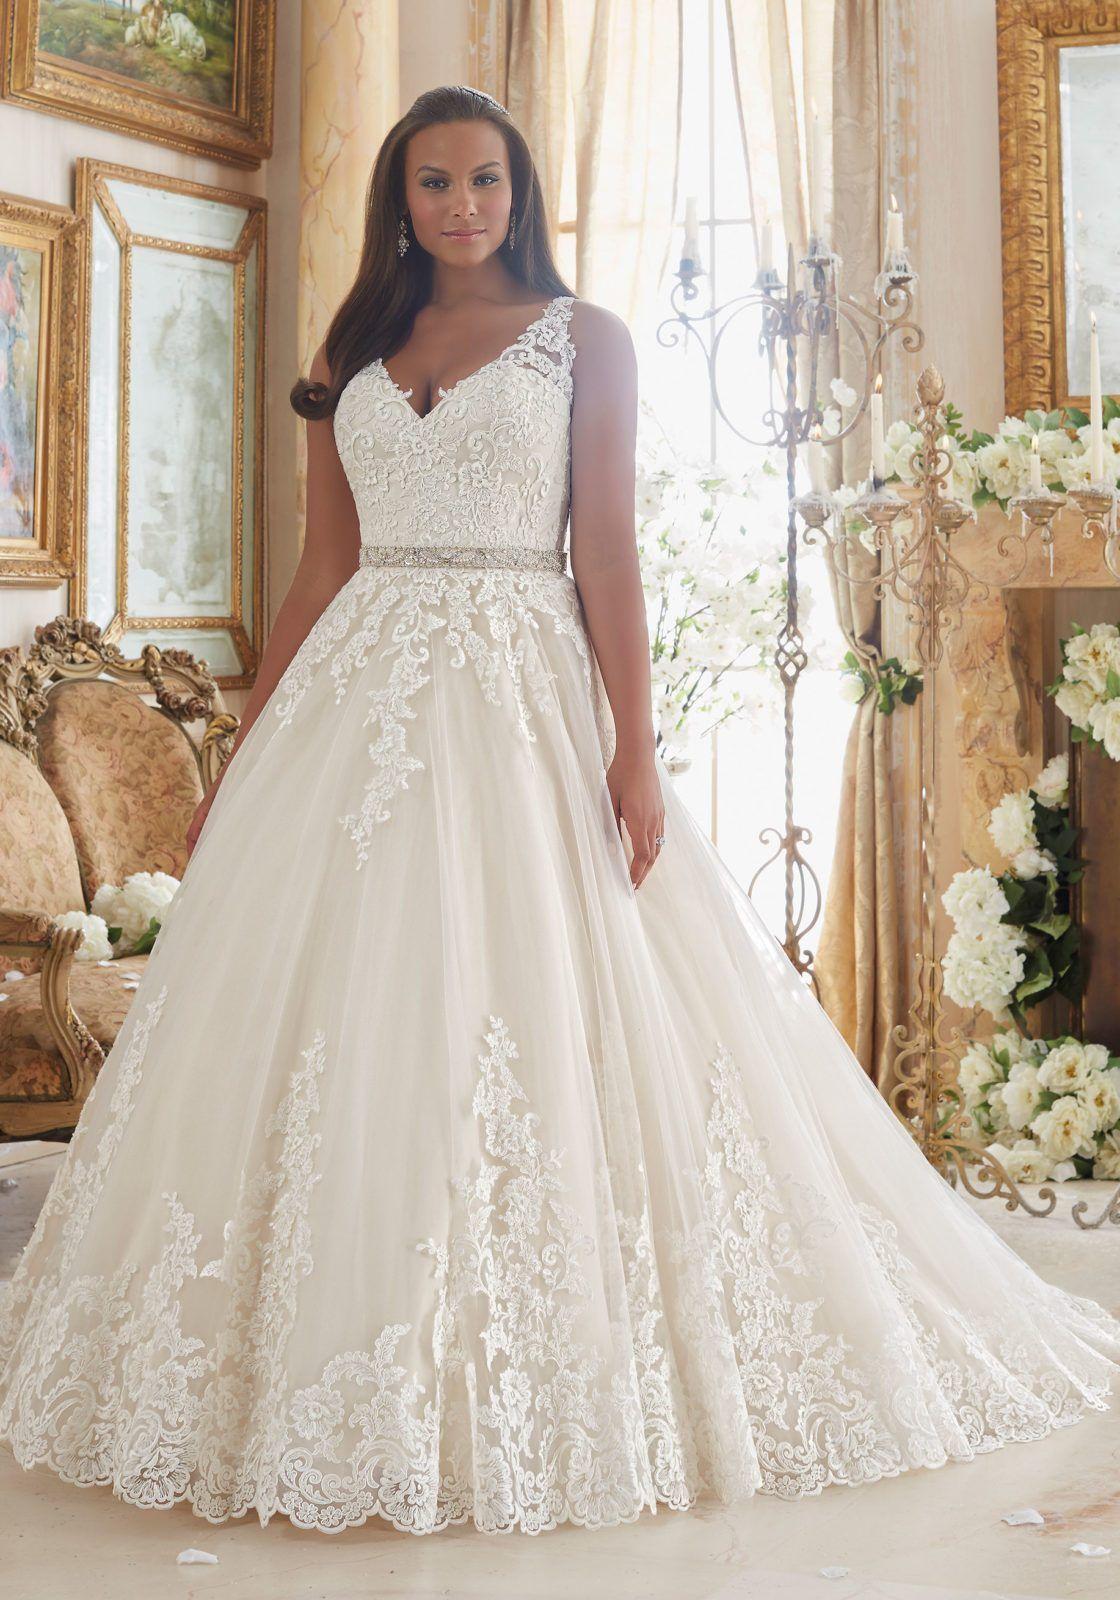 33++ Plus size ball gown wedding dresses ideas information